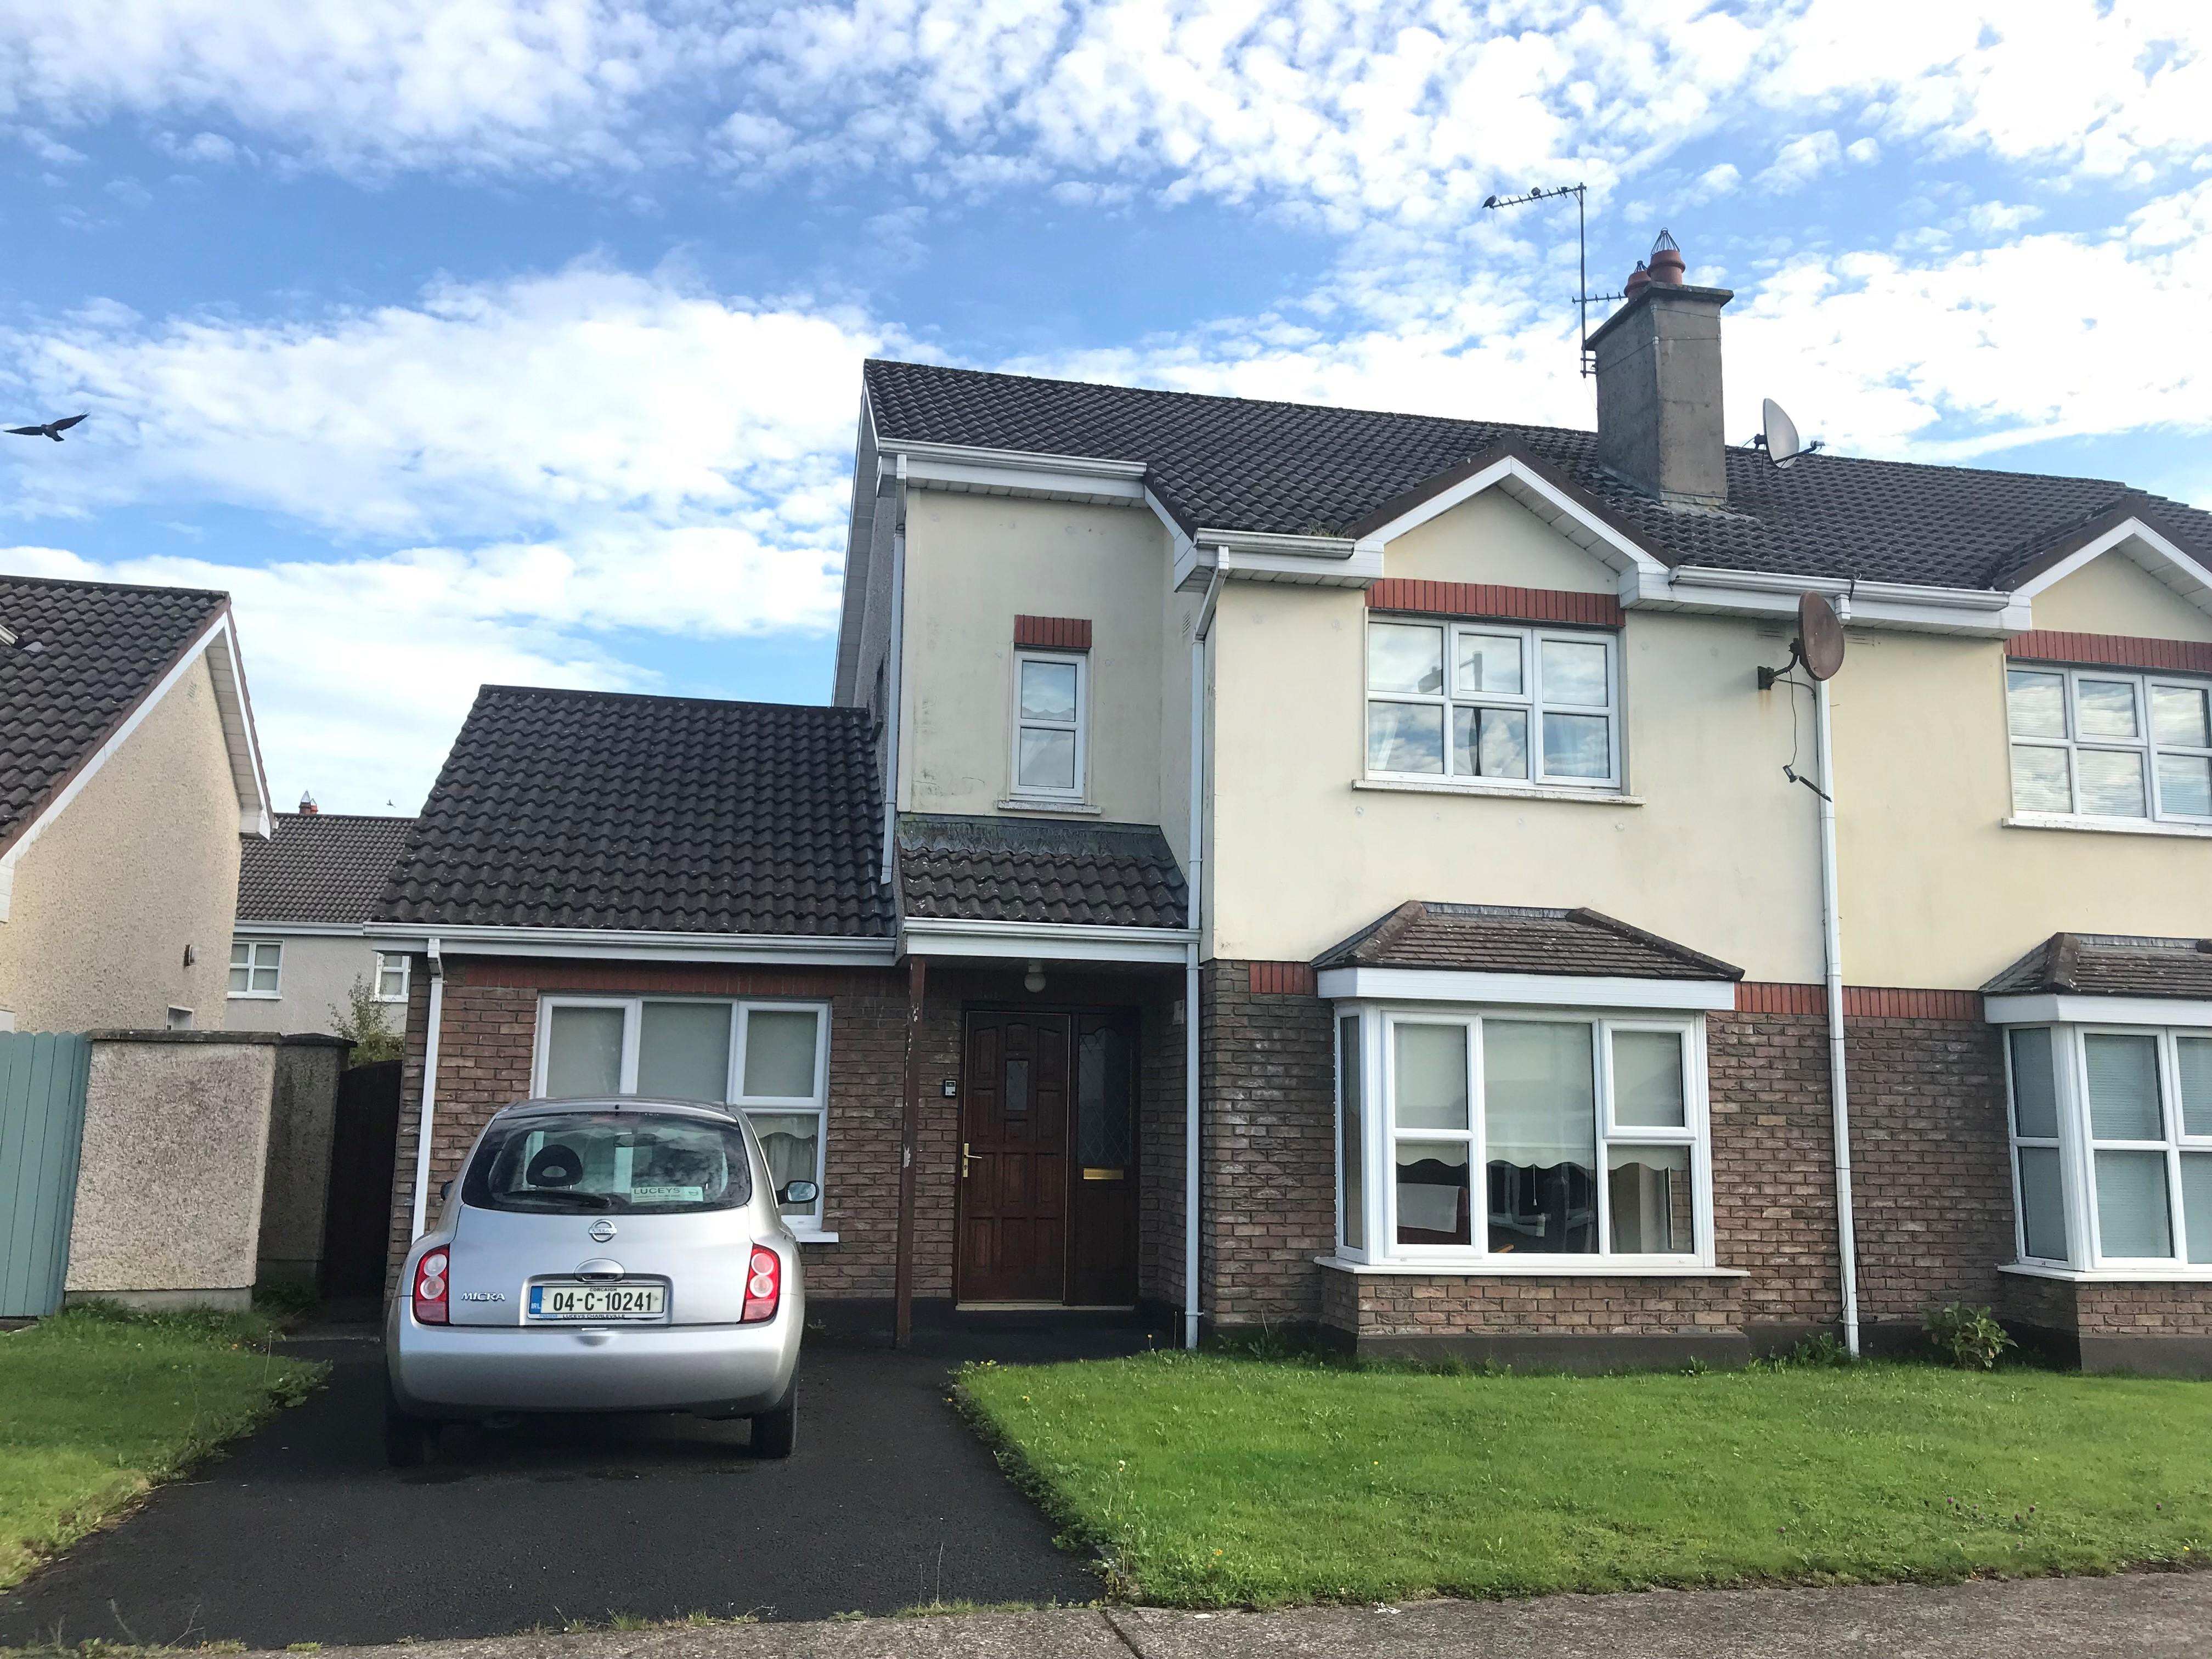 15 Castlemara, Annacotty, Limerick